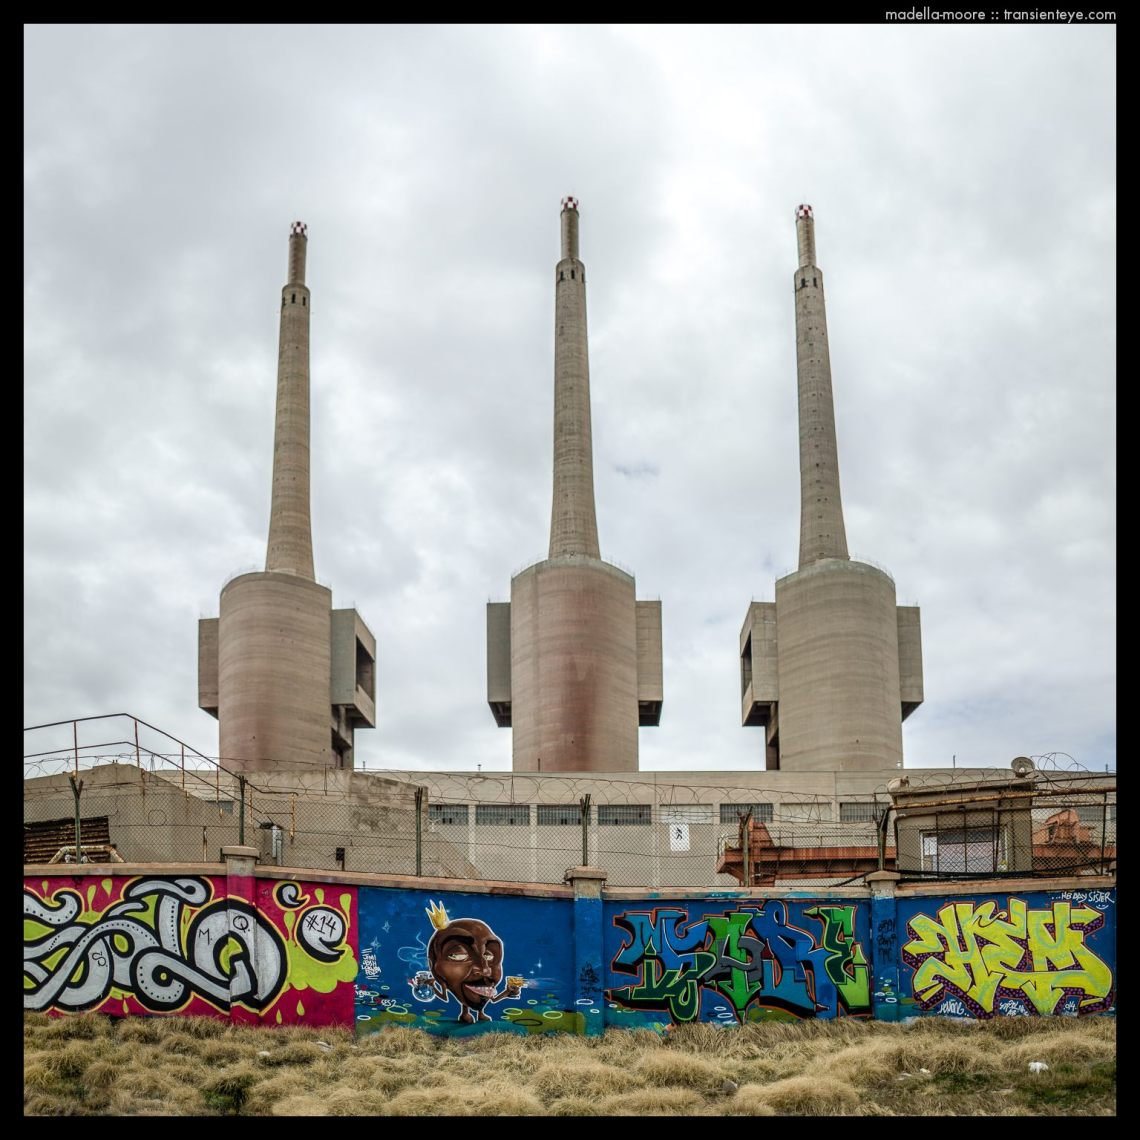 Old power station chimneys, Graffitti, Sant Andrià de Besòs